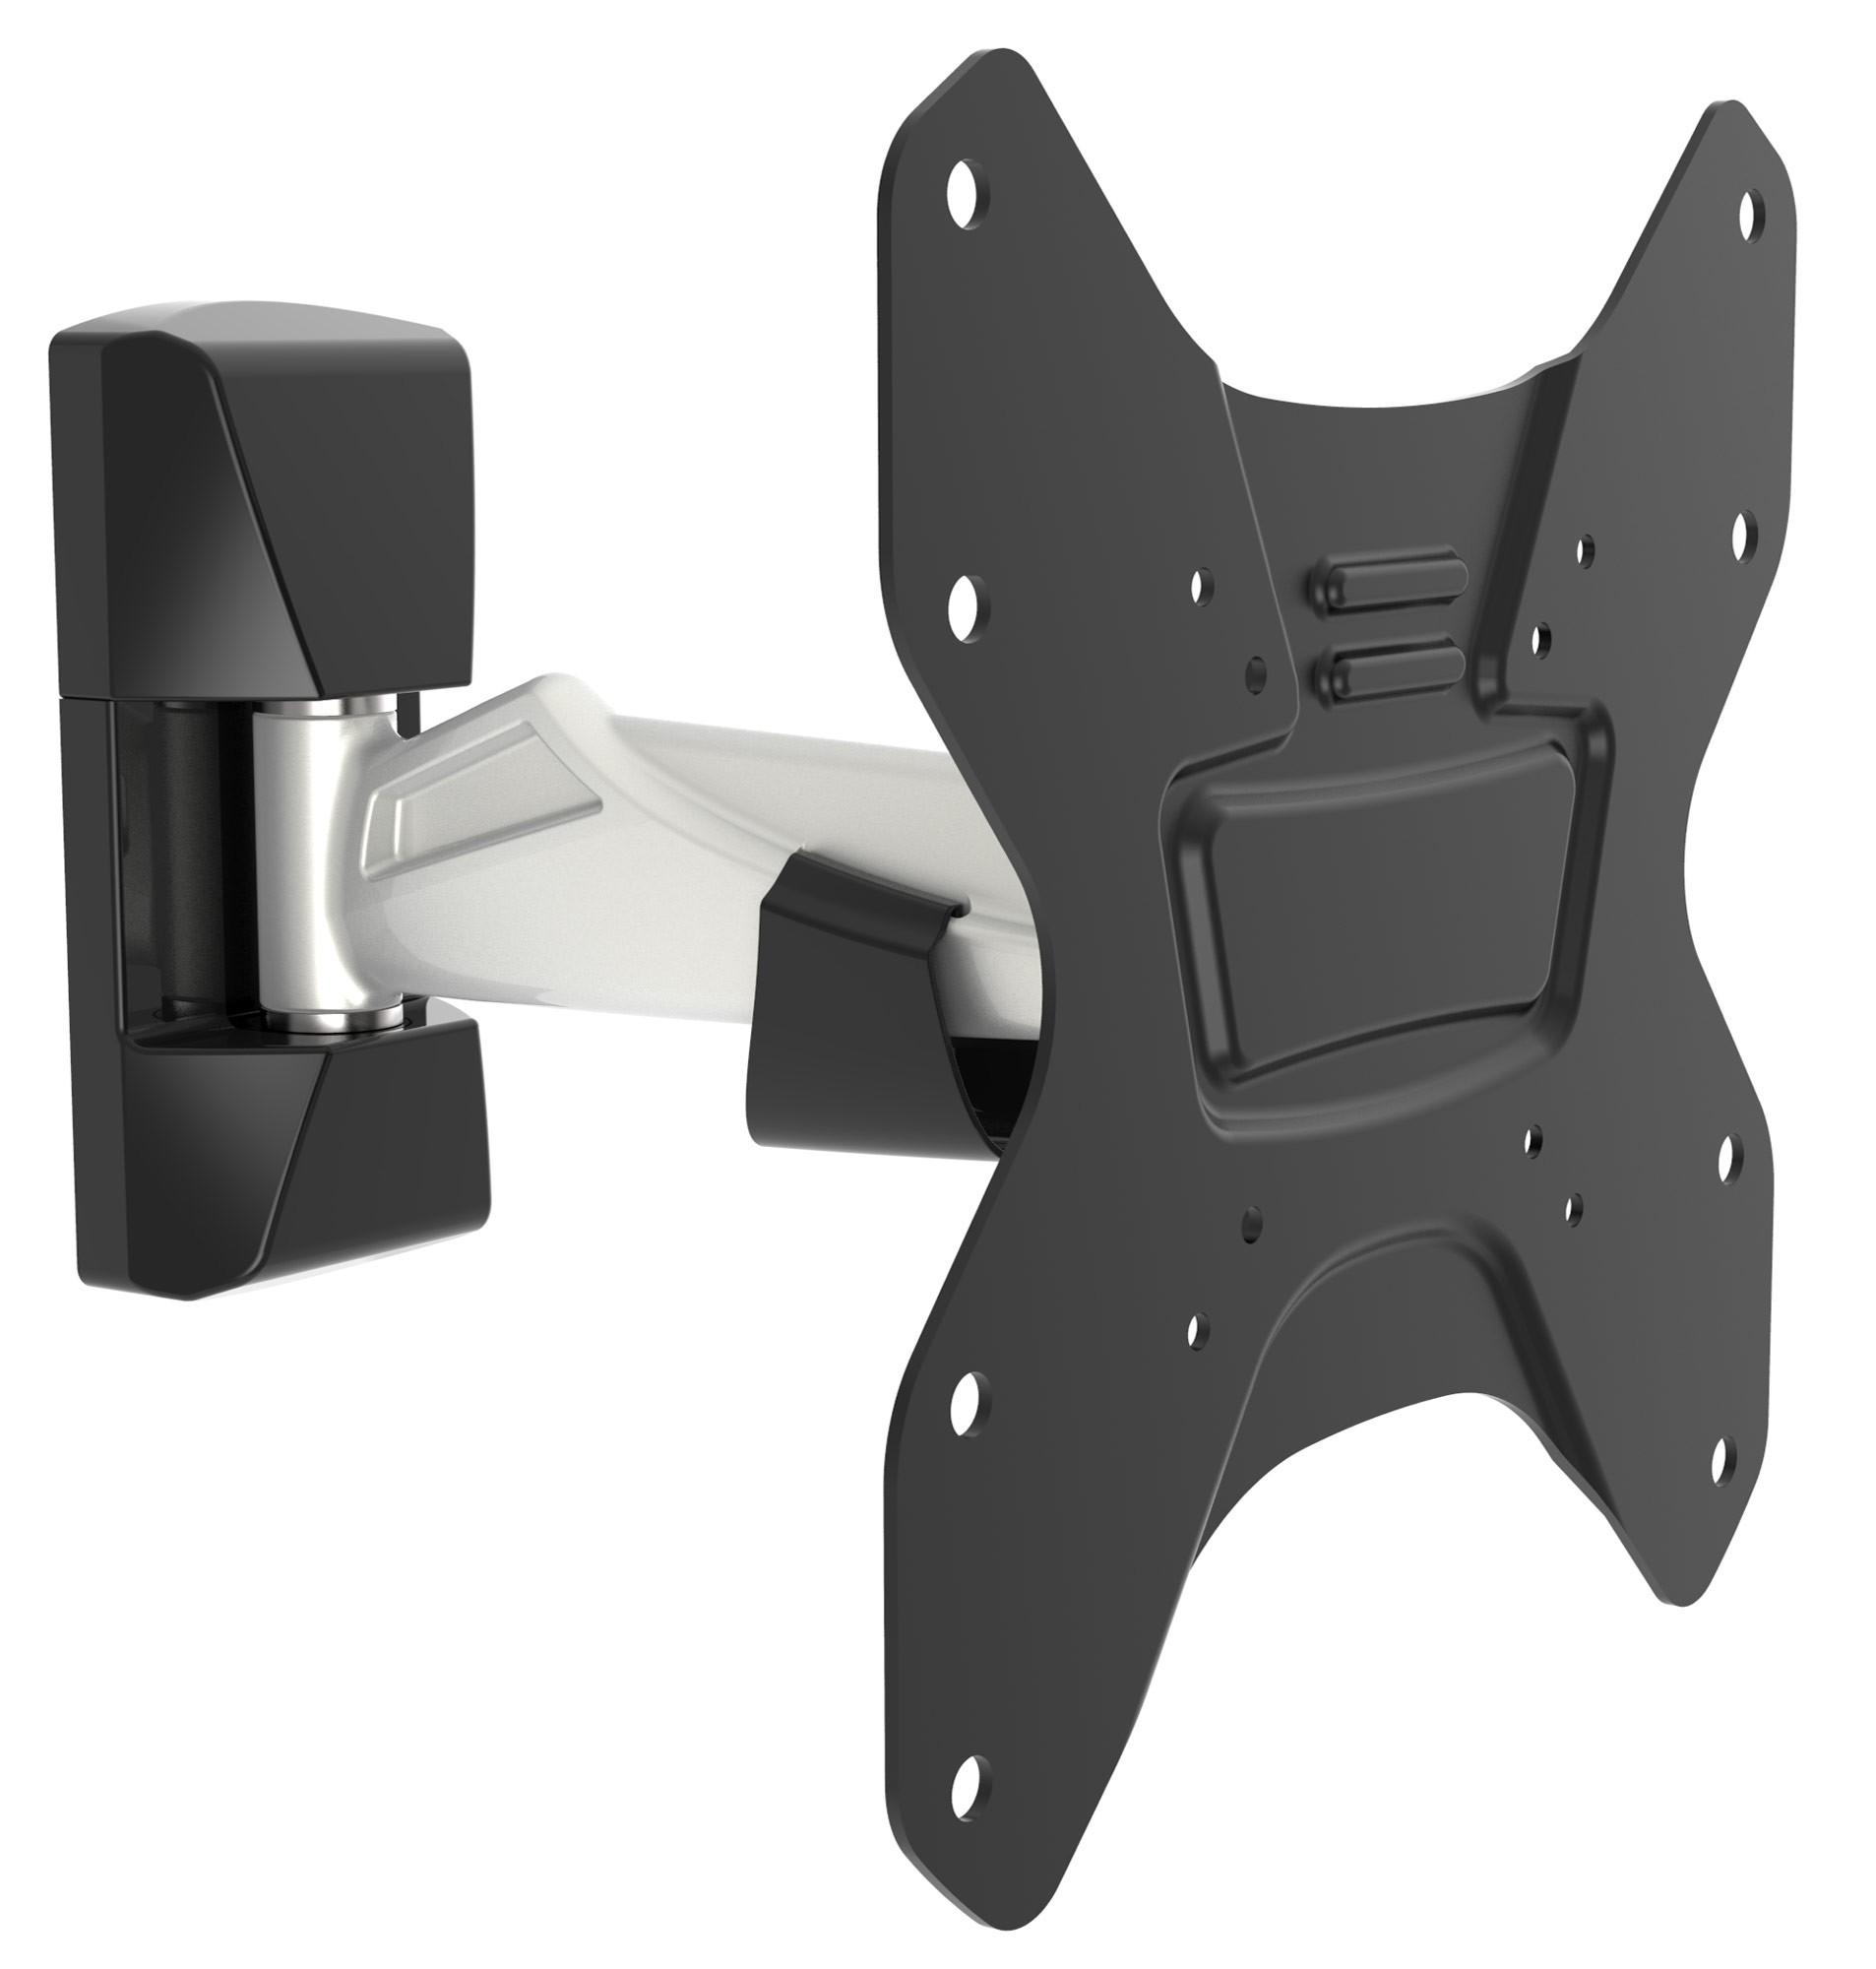 Aluminium Wandhalterung Tv Schwenkbar Neigbar S2922 Universal Lcd